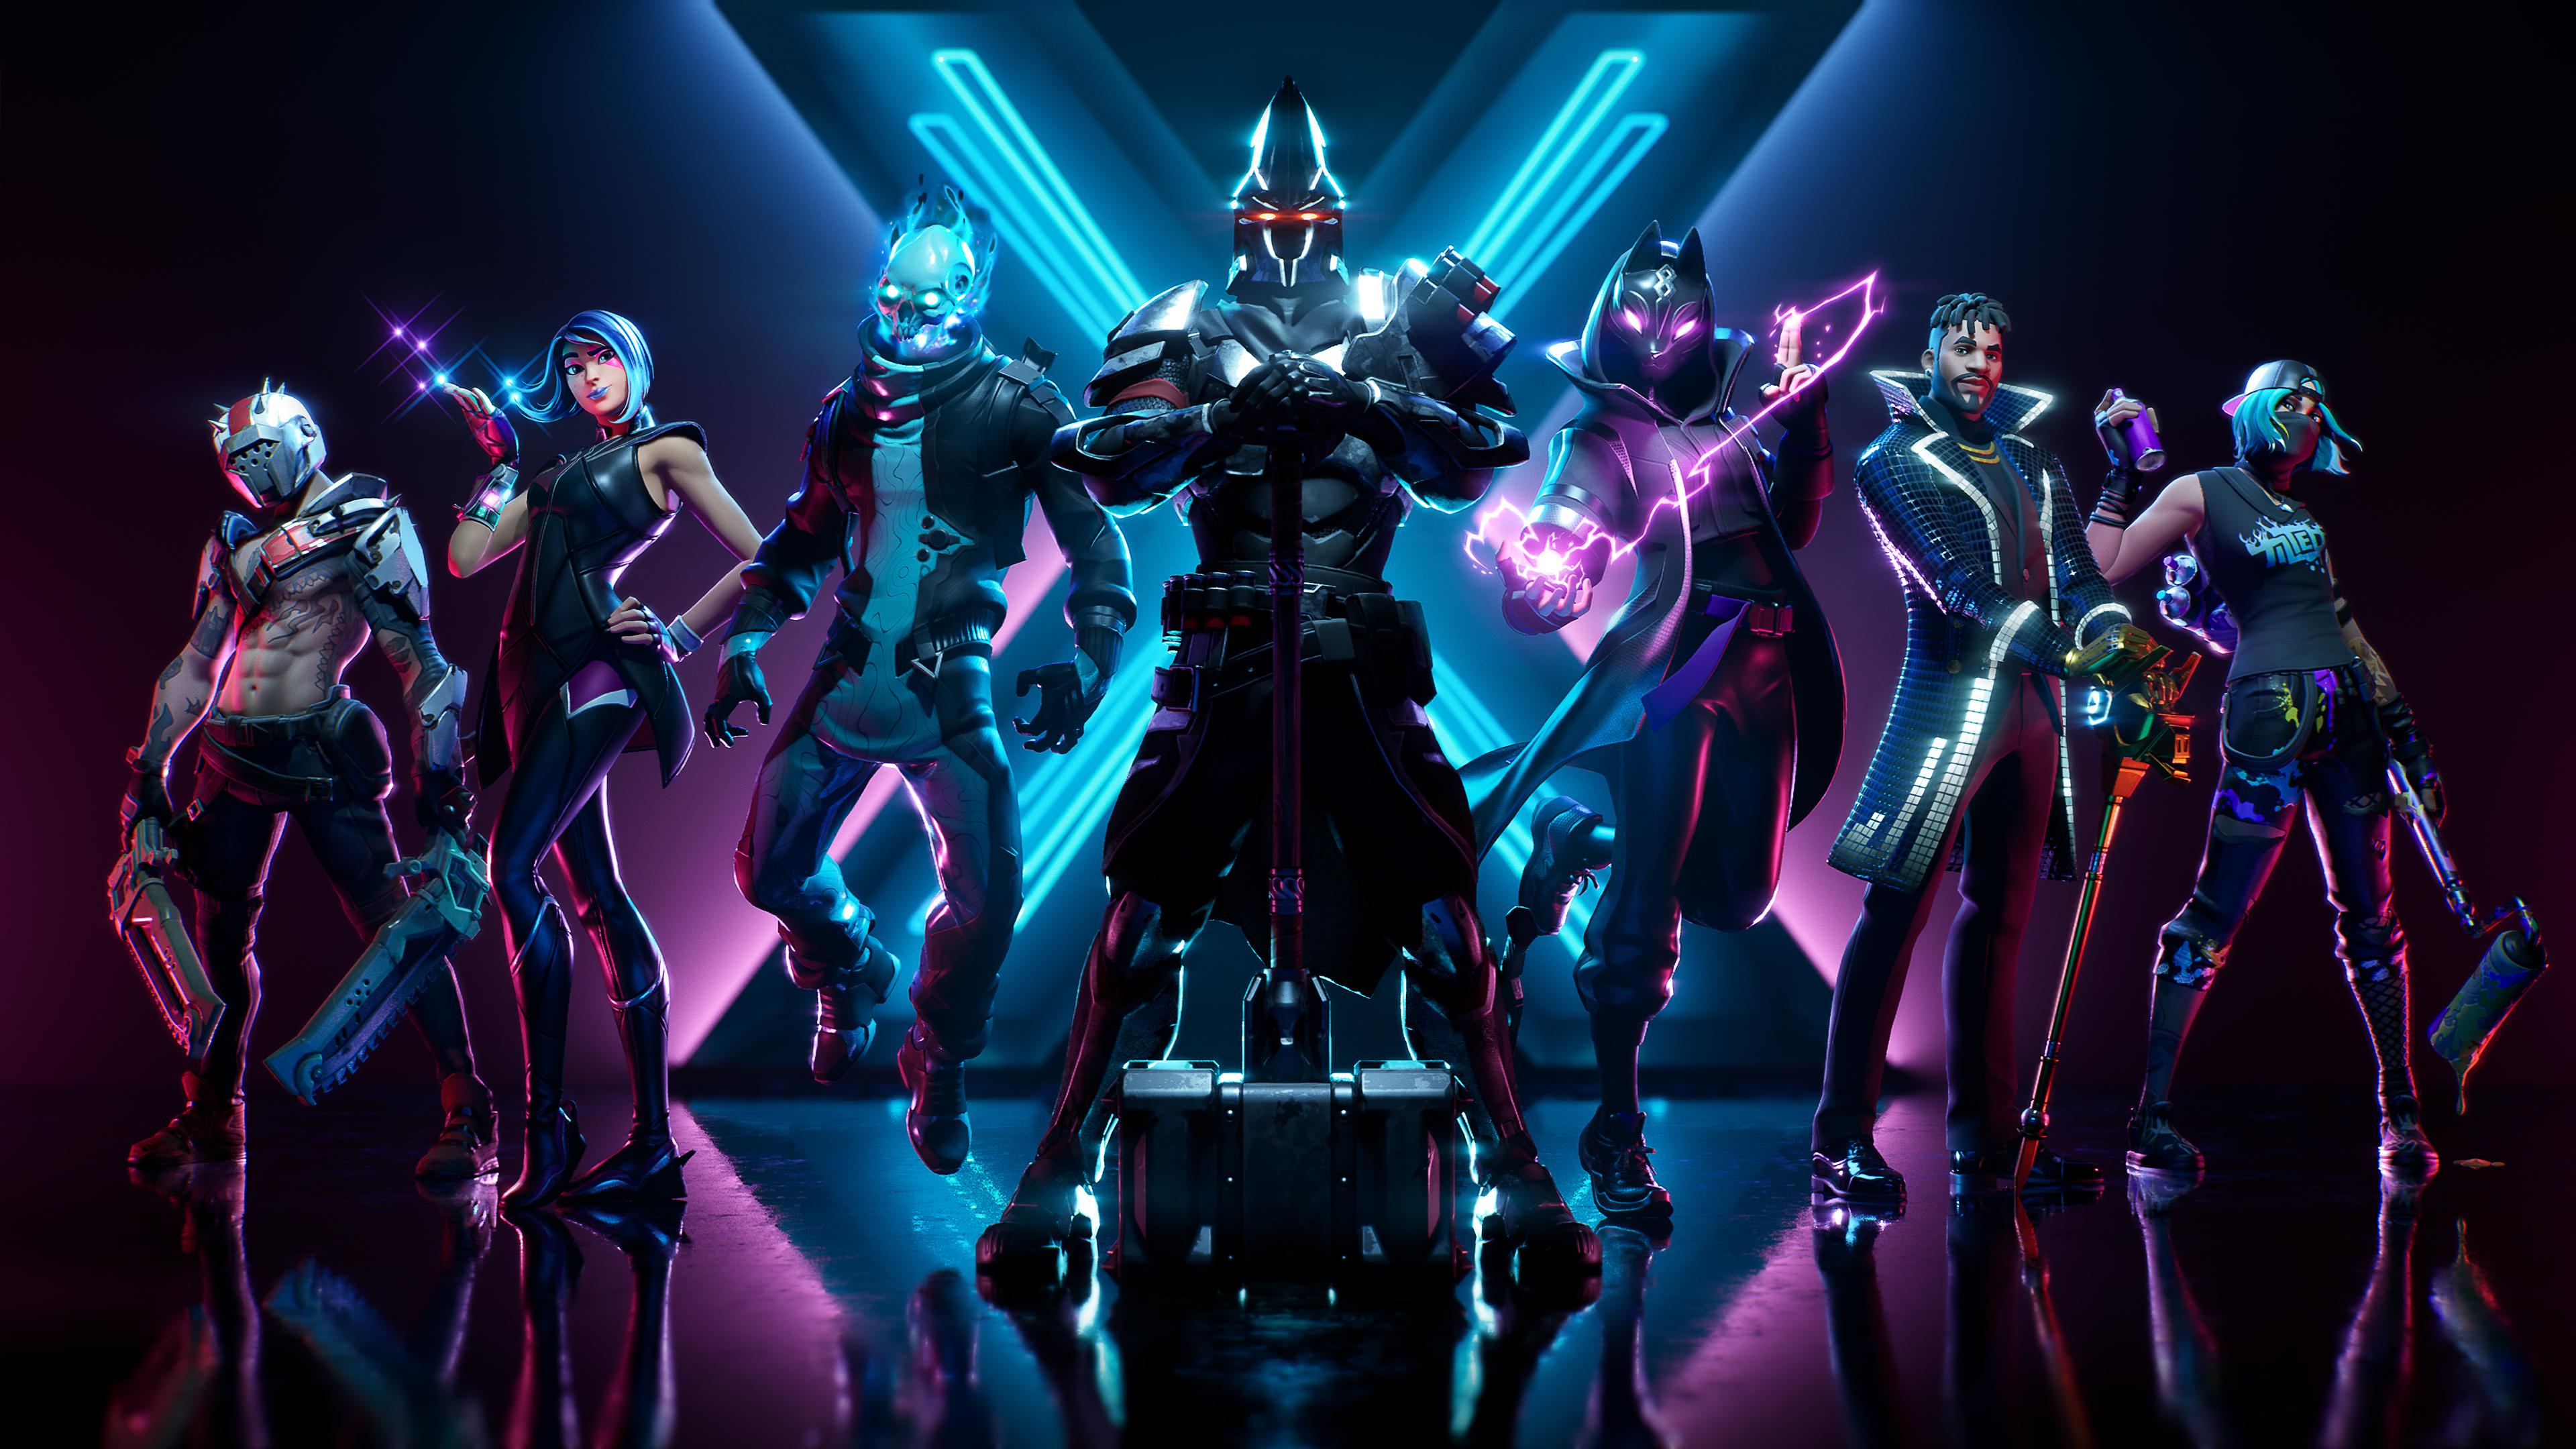 Fortnite Season X Hd Games 4k Wallpapers Images